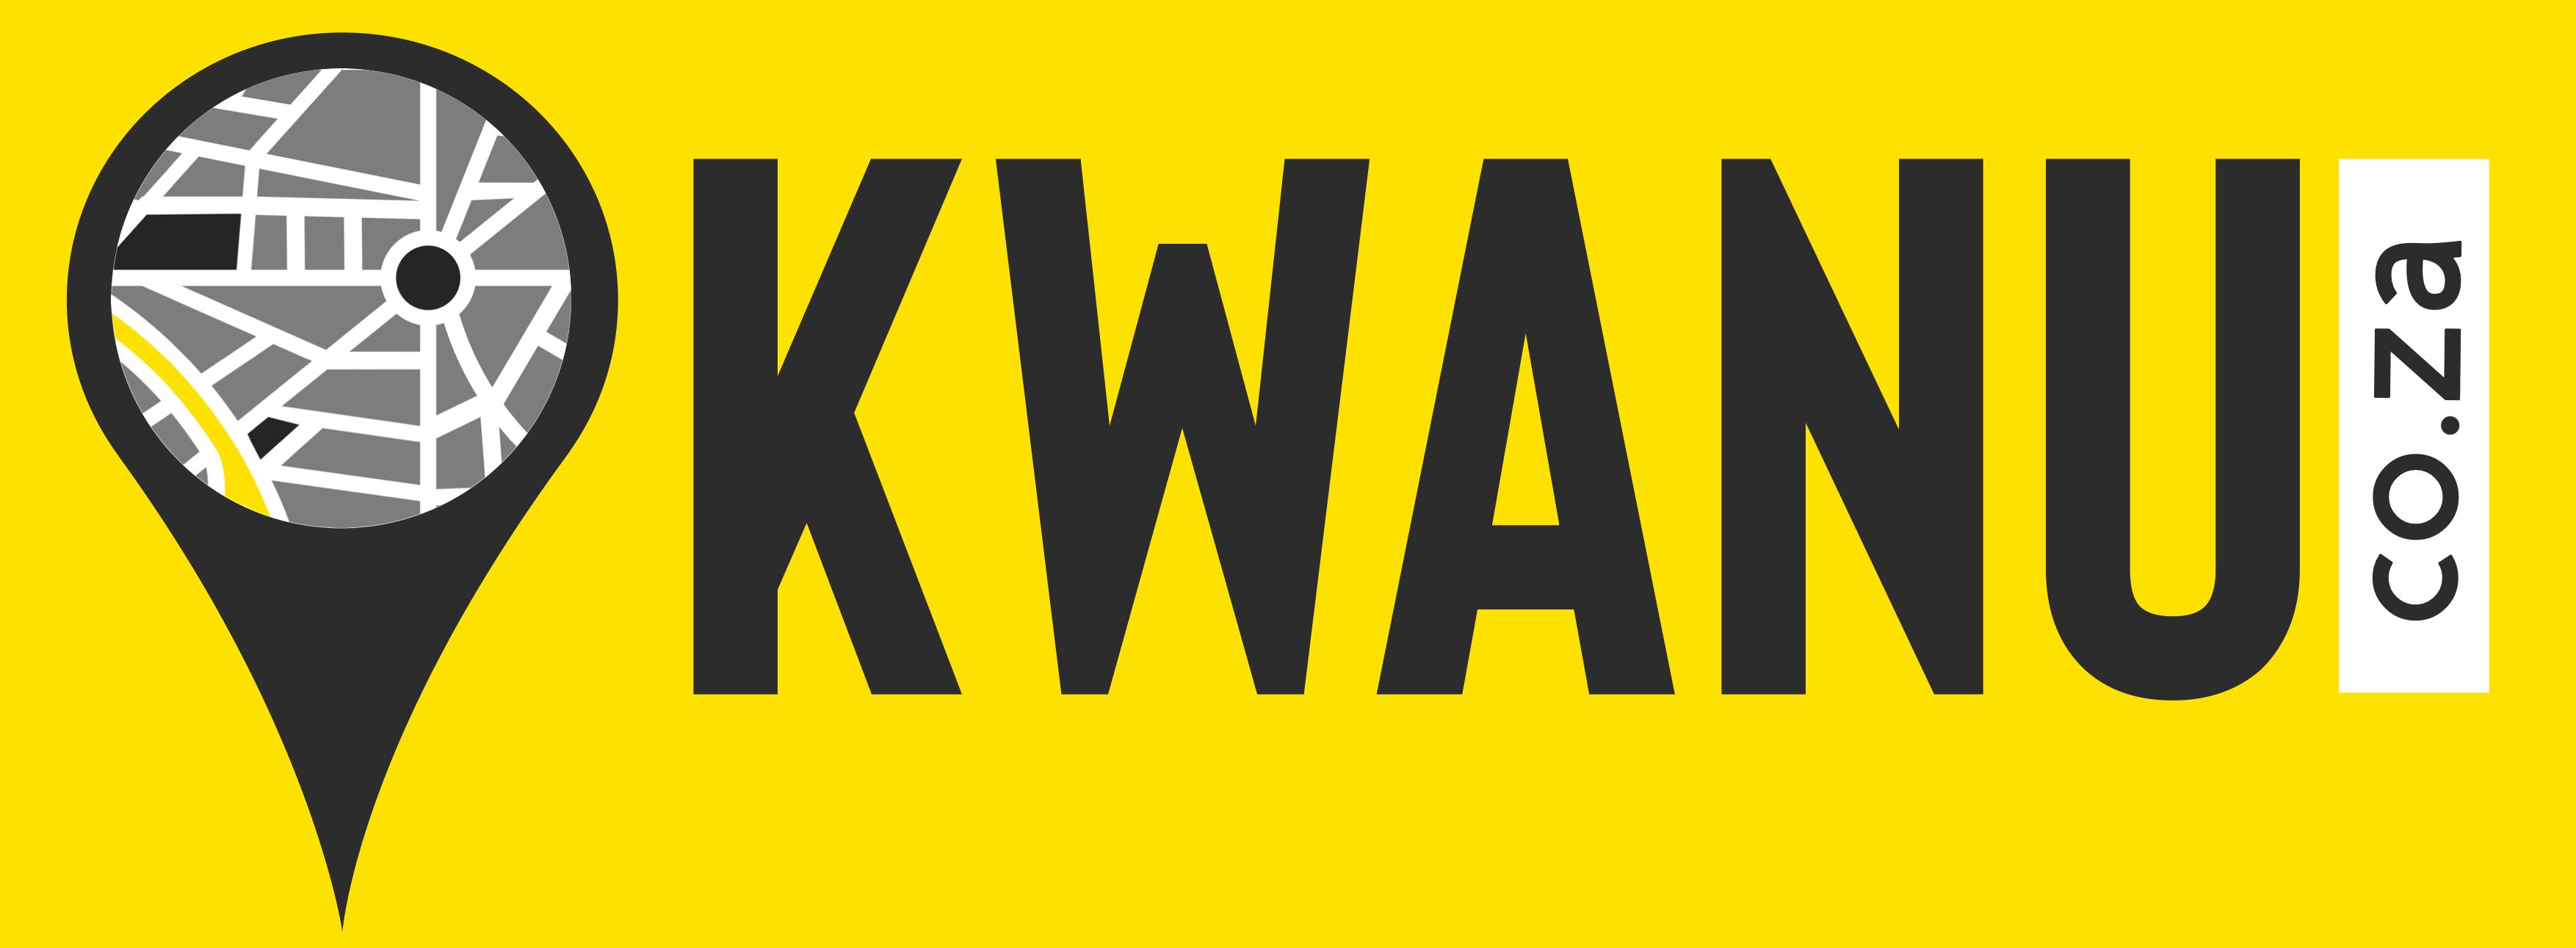 kwanu logo online supermarket westville